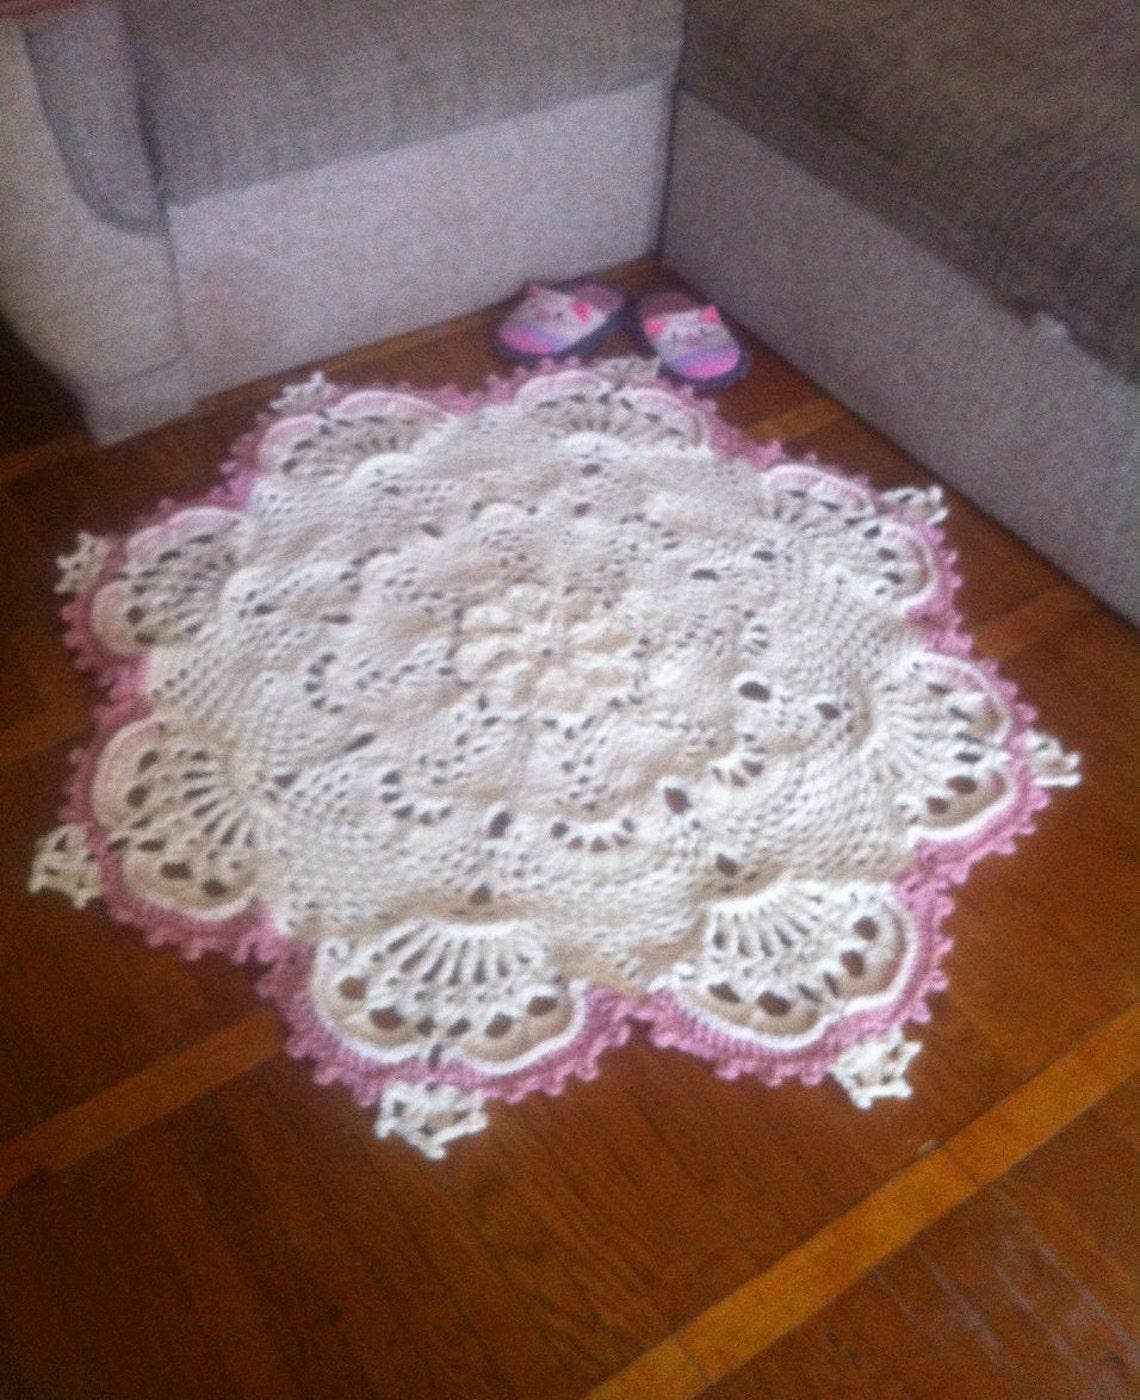 3d Crochet Doily Round Doily Rug 49 Inches Crochet Rug White Etsy